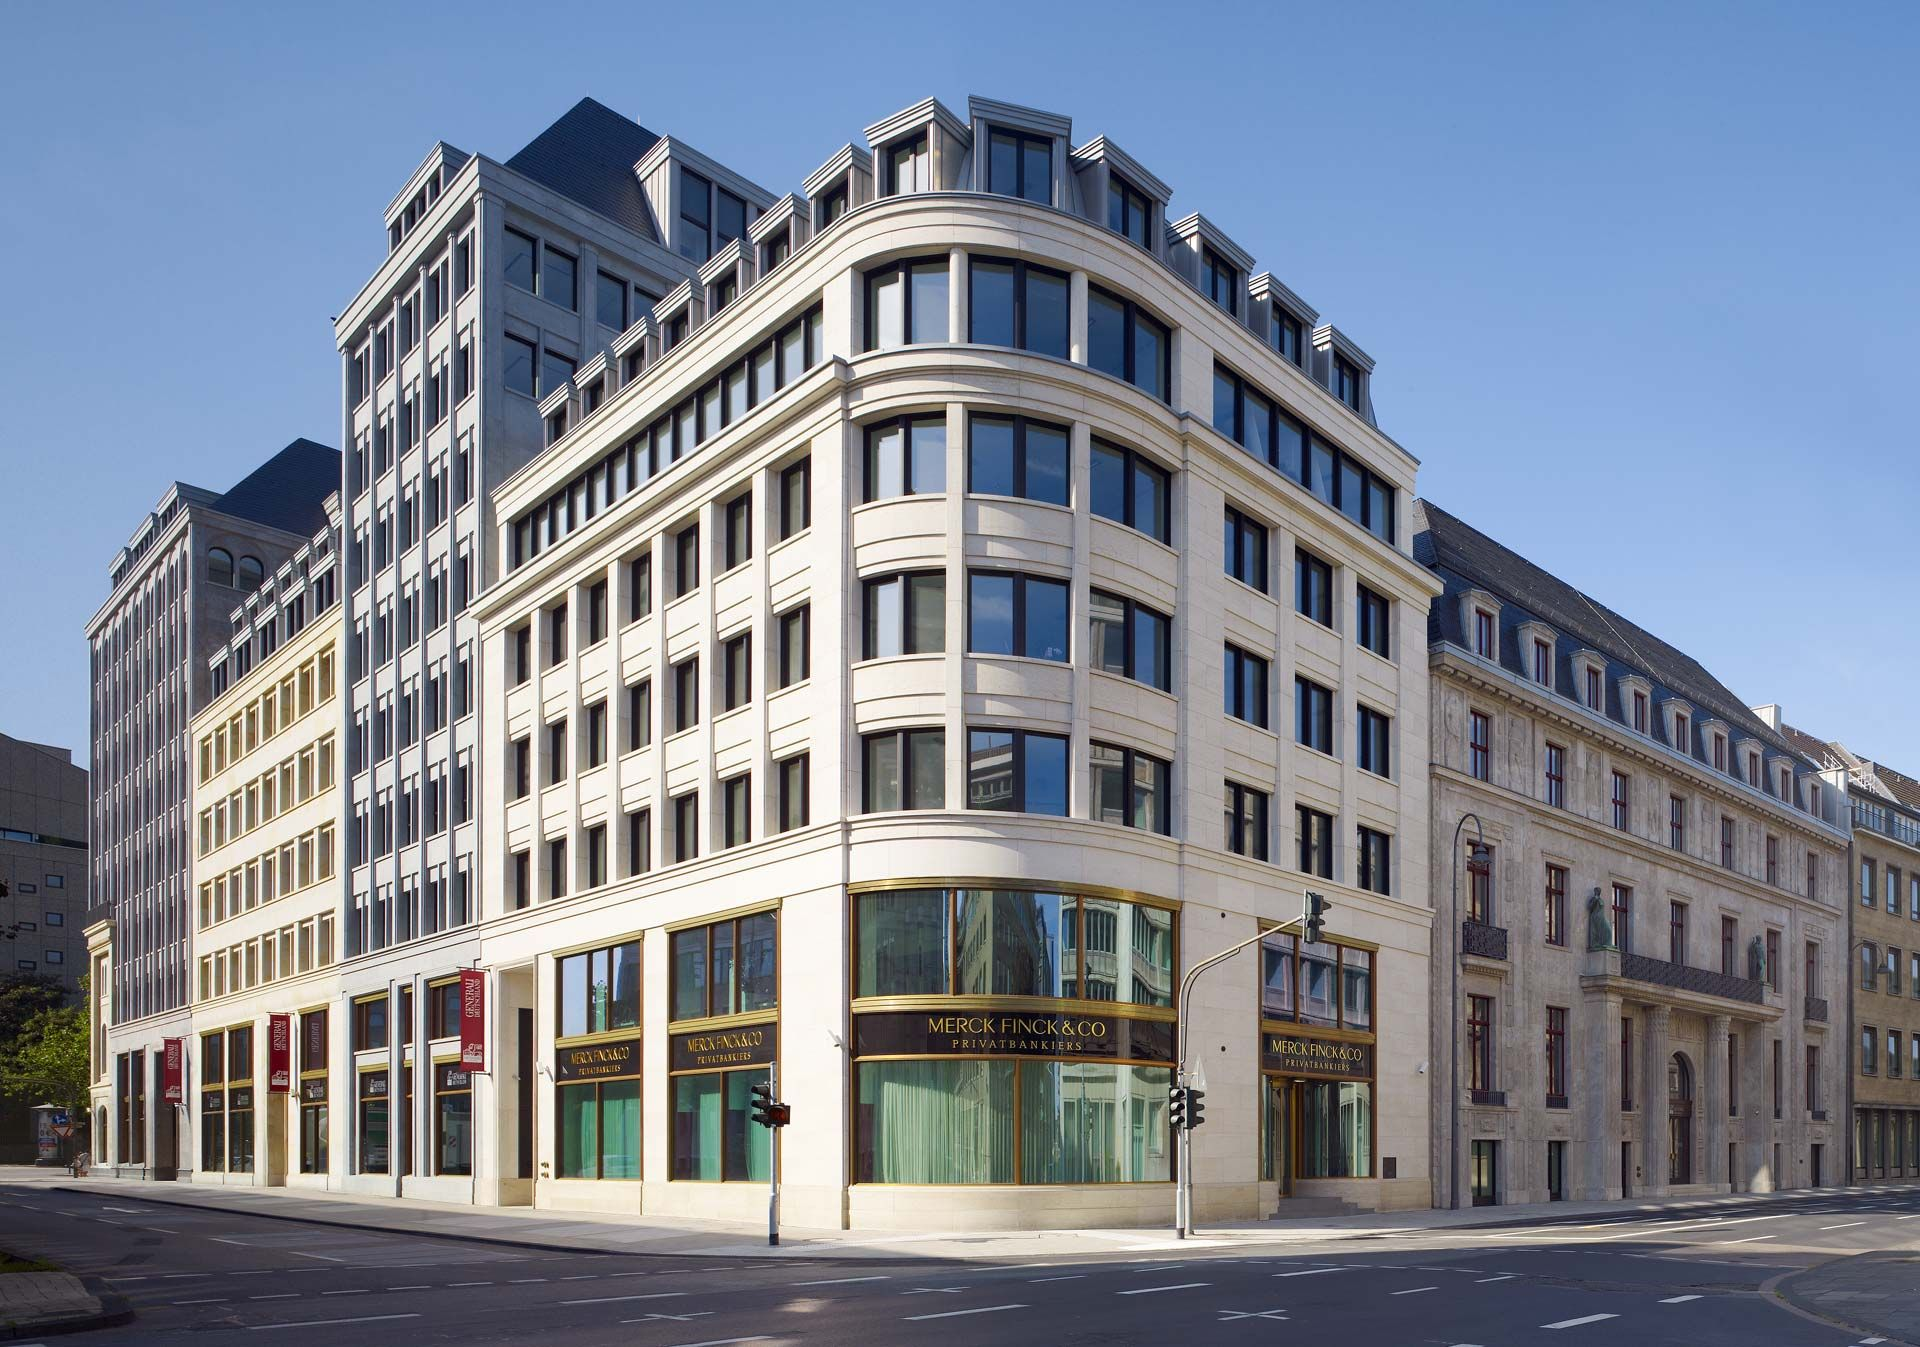 Architektur Köln dominium köln prof hans kollhoff architekten foto martin